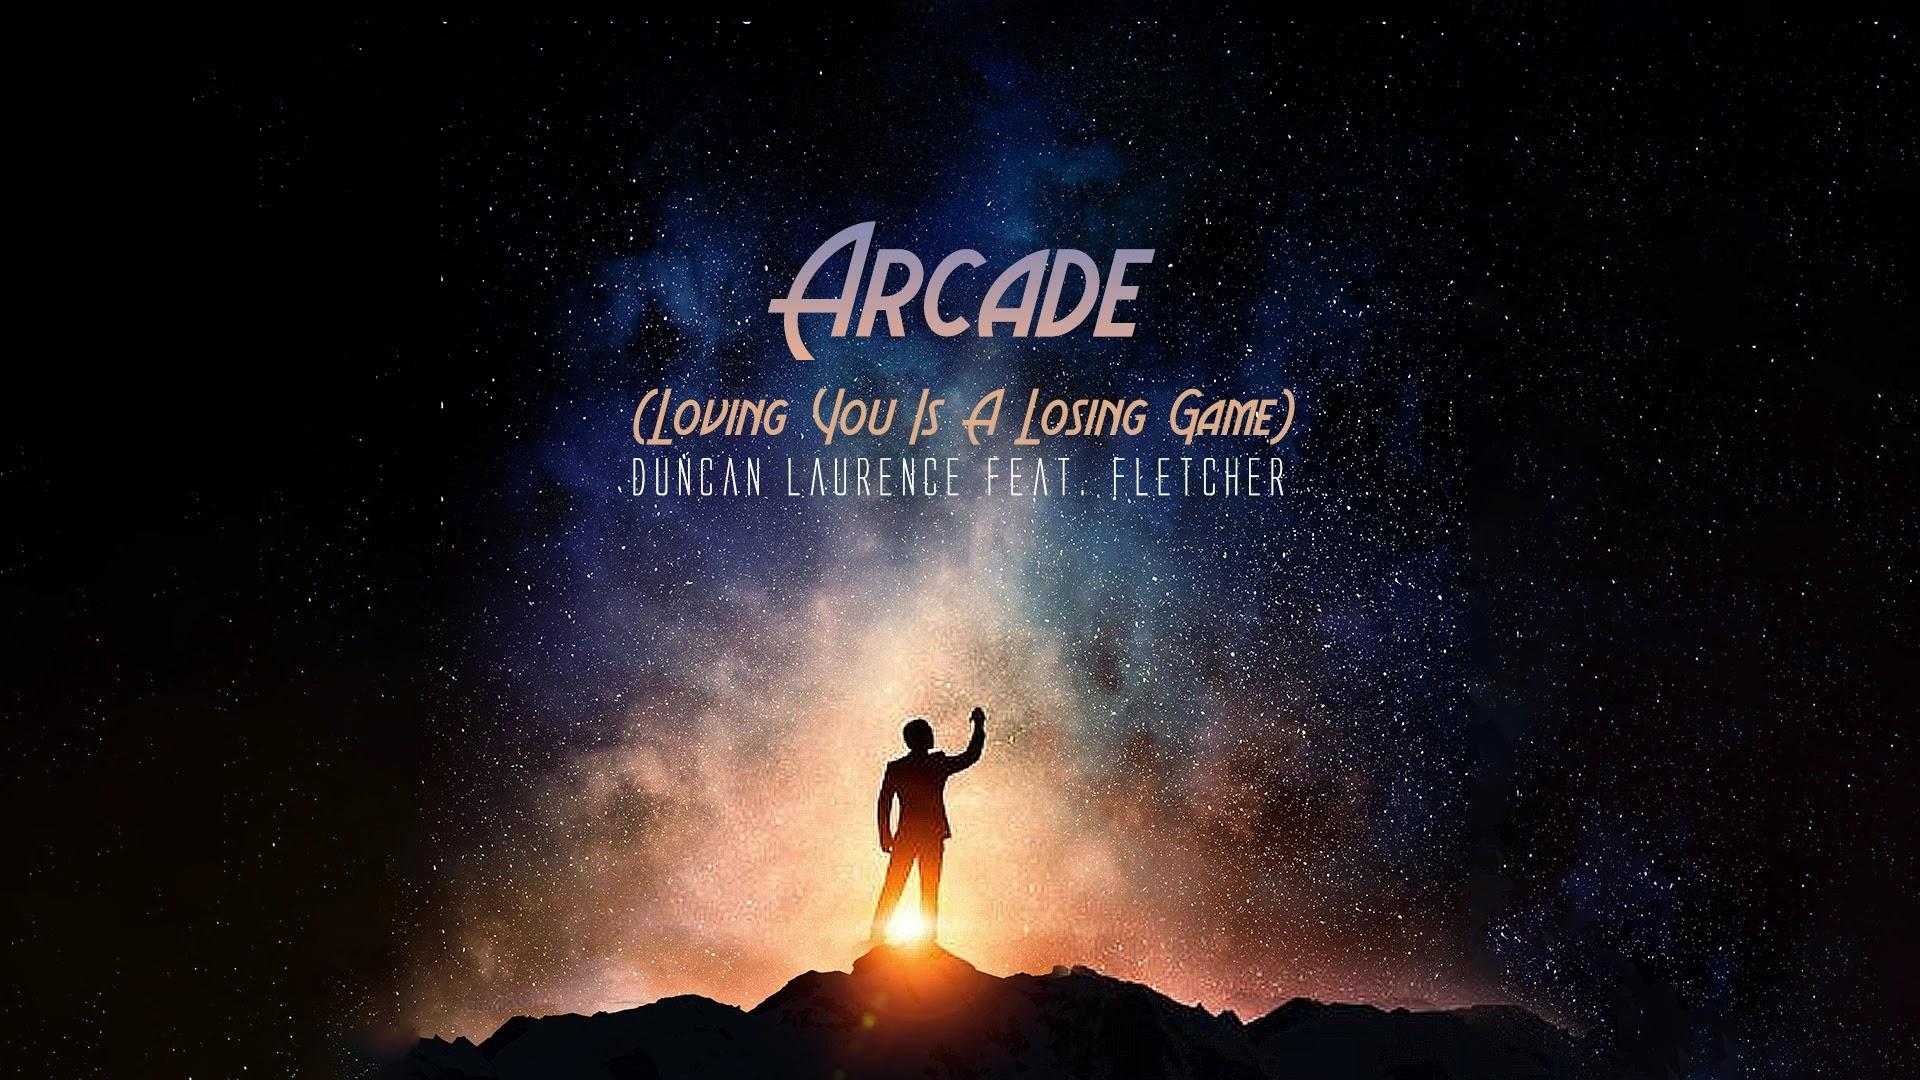 Arcade - Duncan Laurence feat. FLETCHER